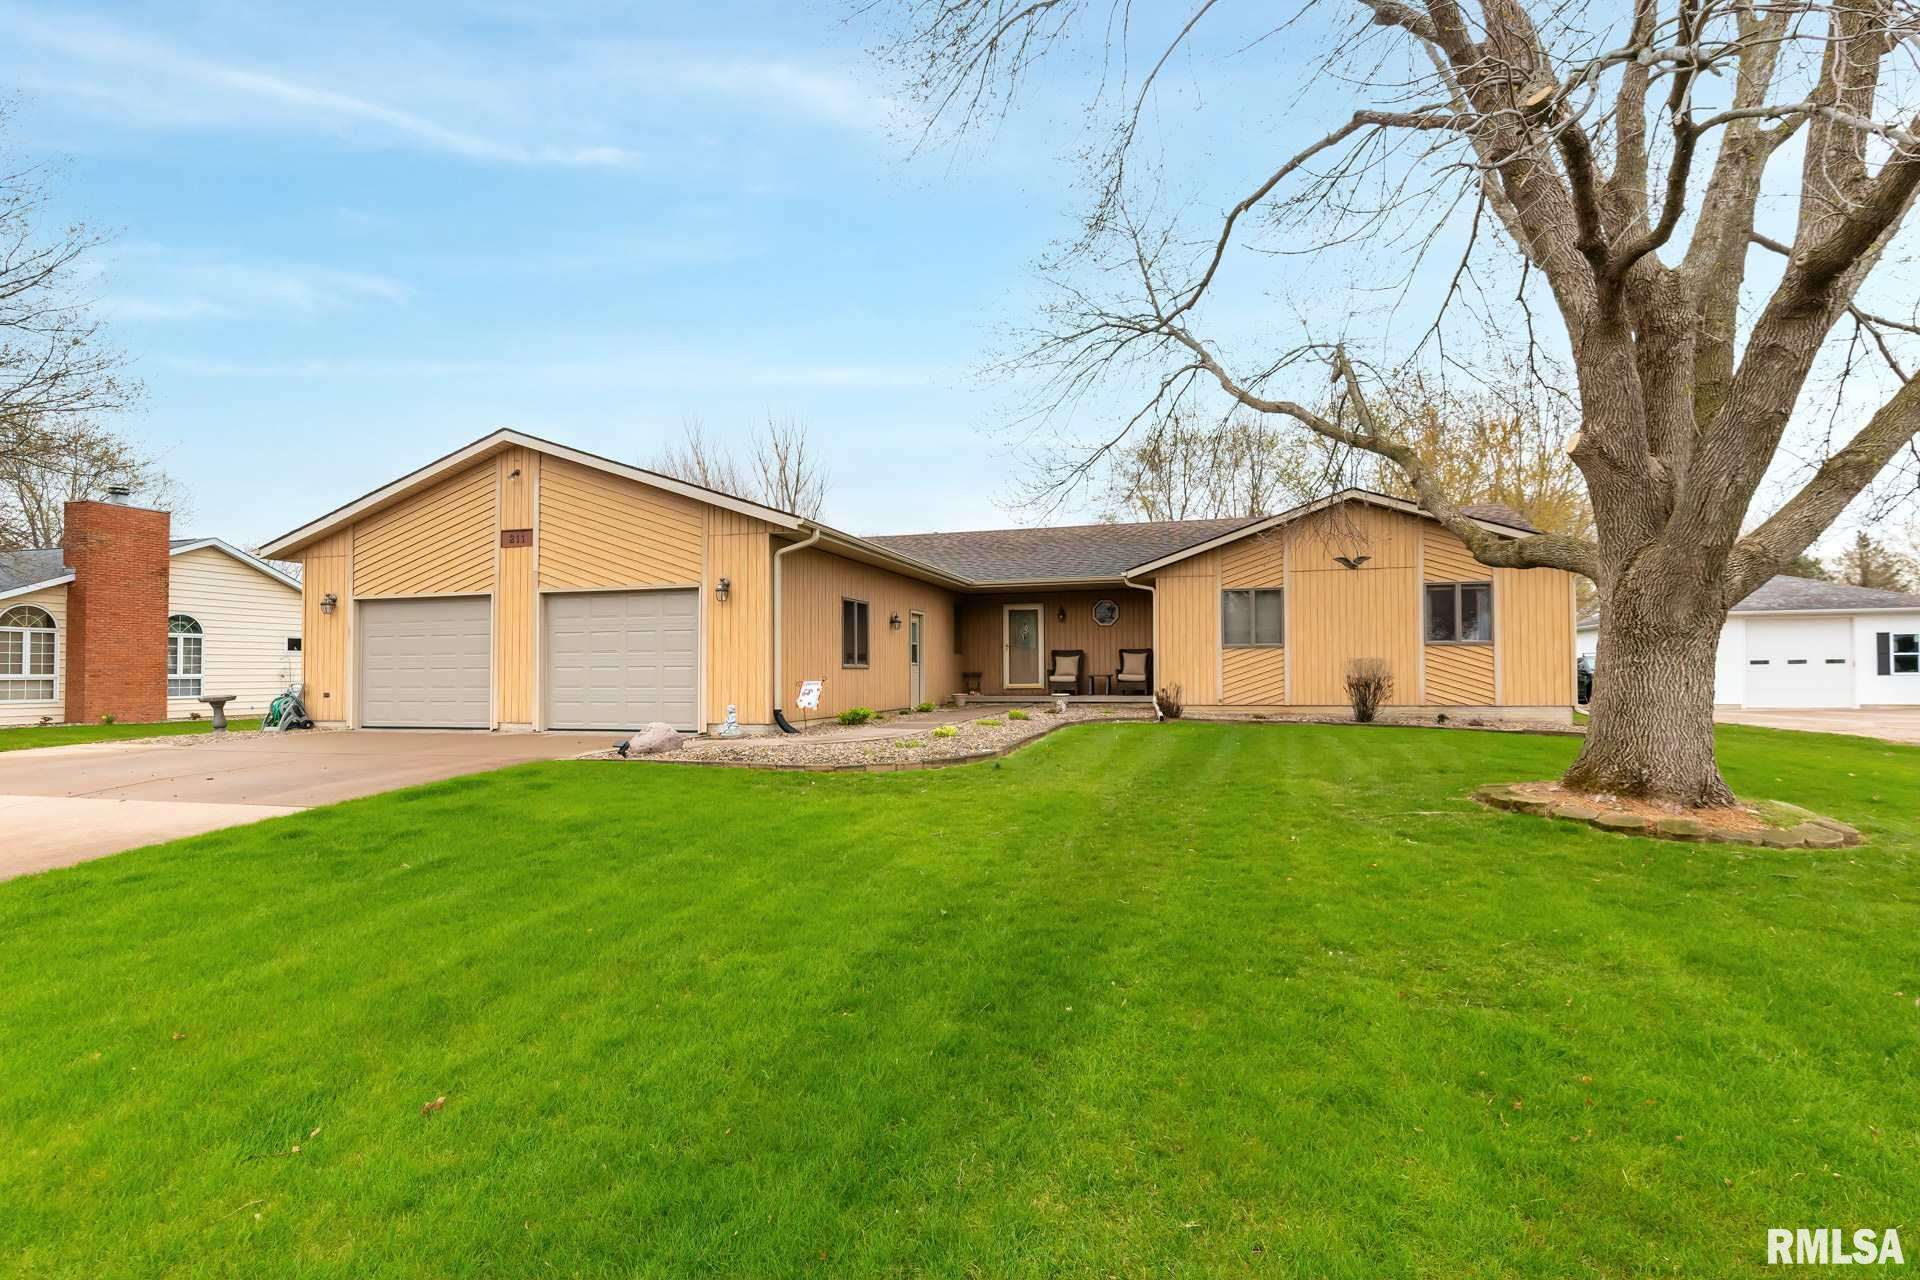 211 S 27TH Property Photo - Eldridge, IA real estate listing